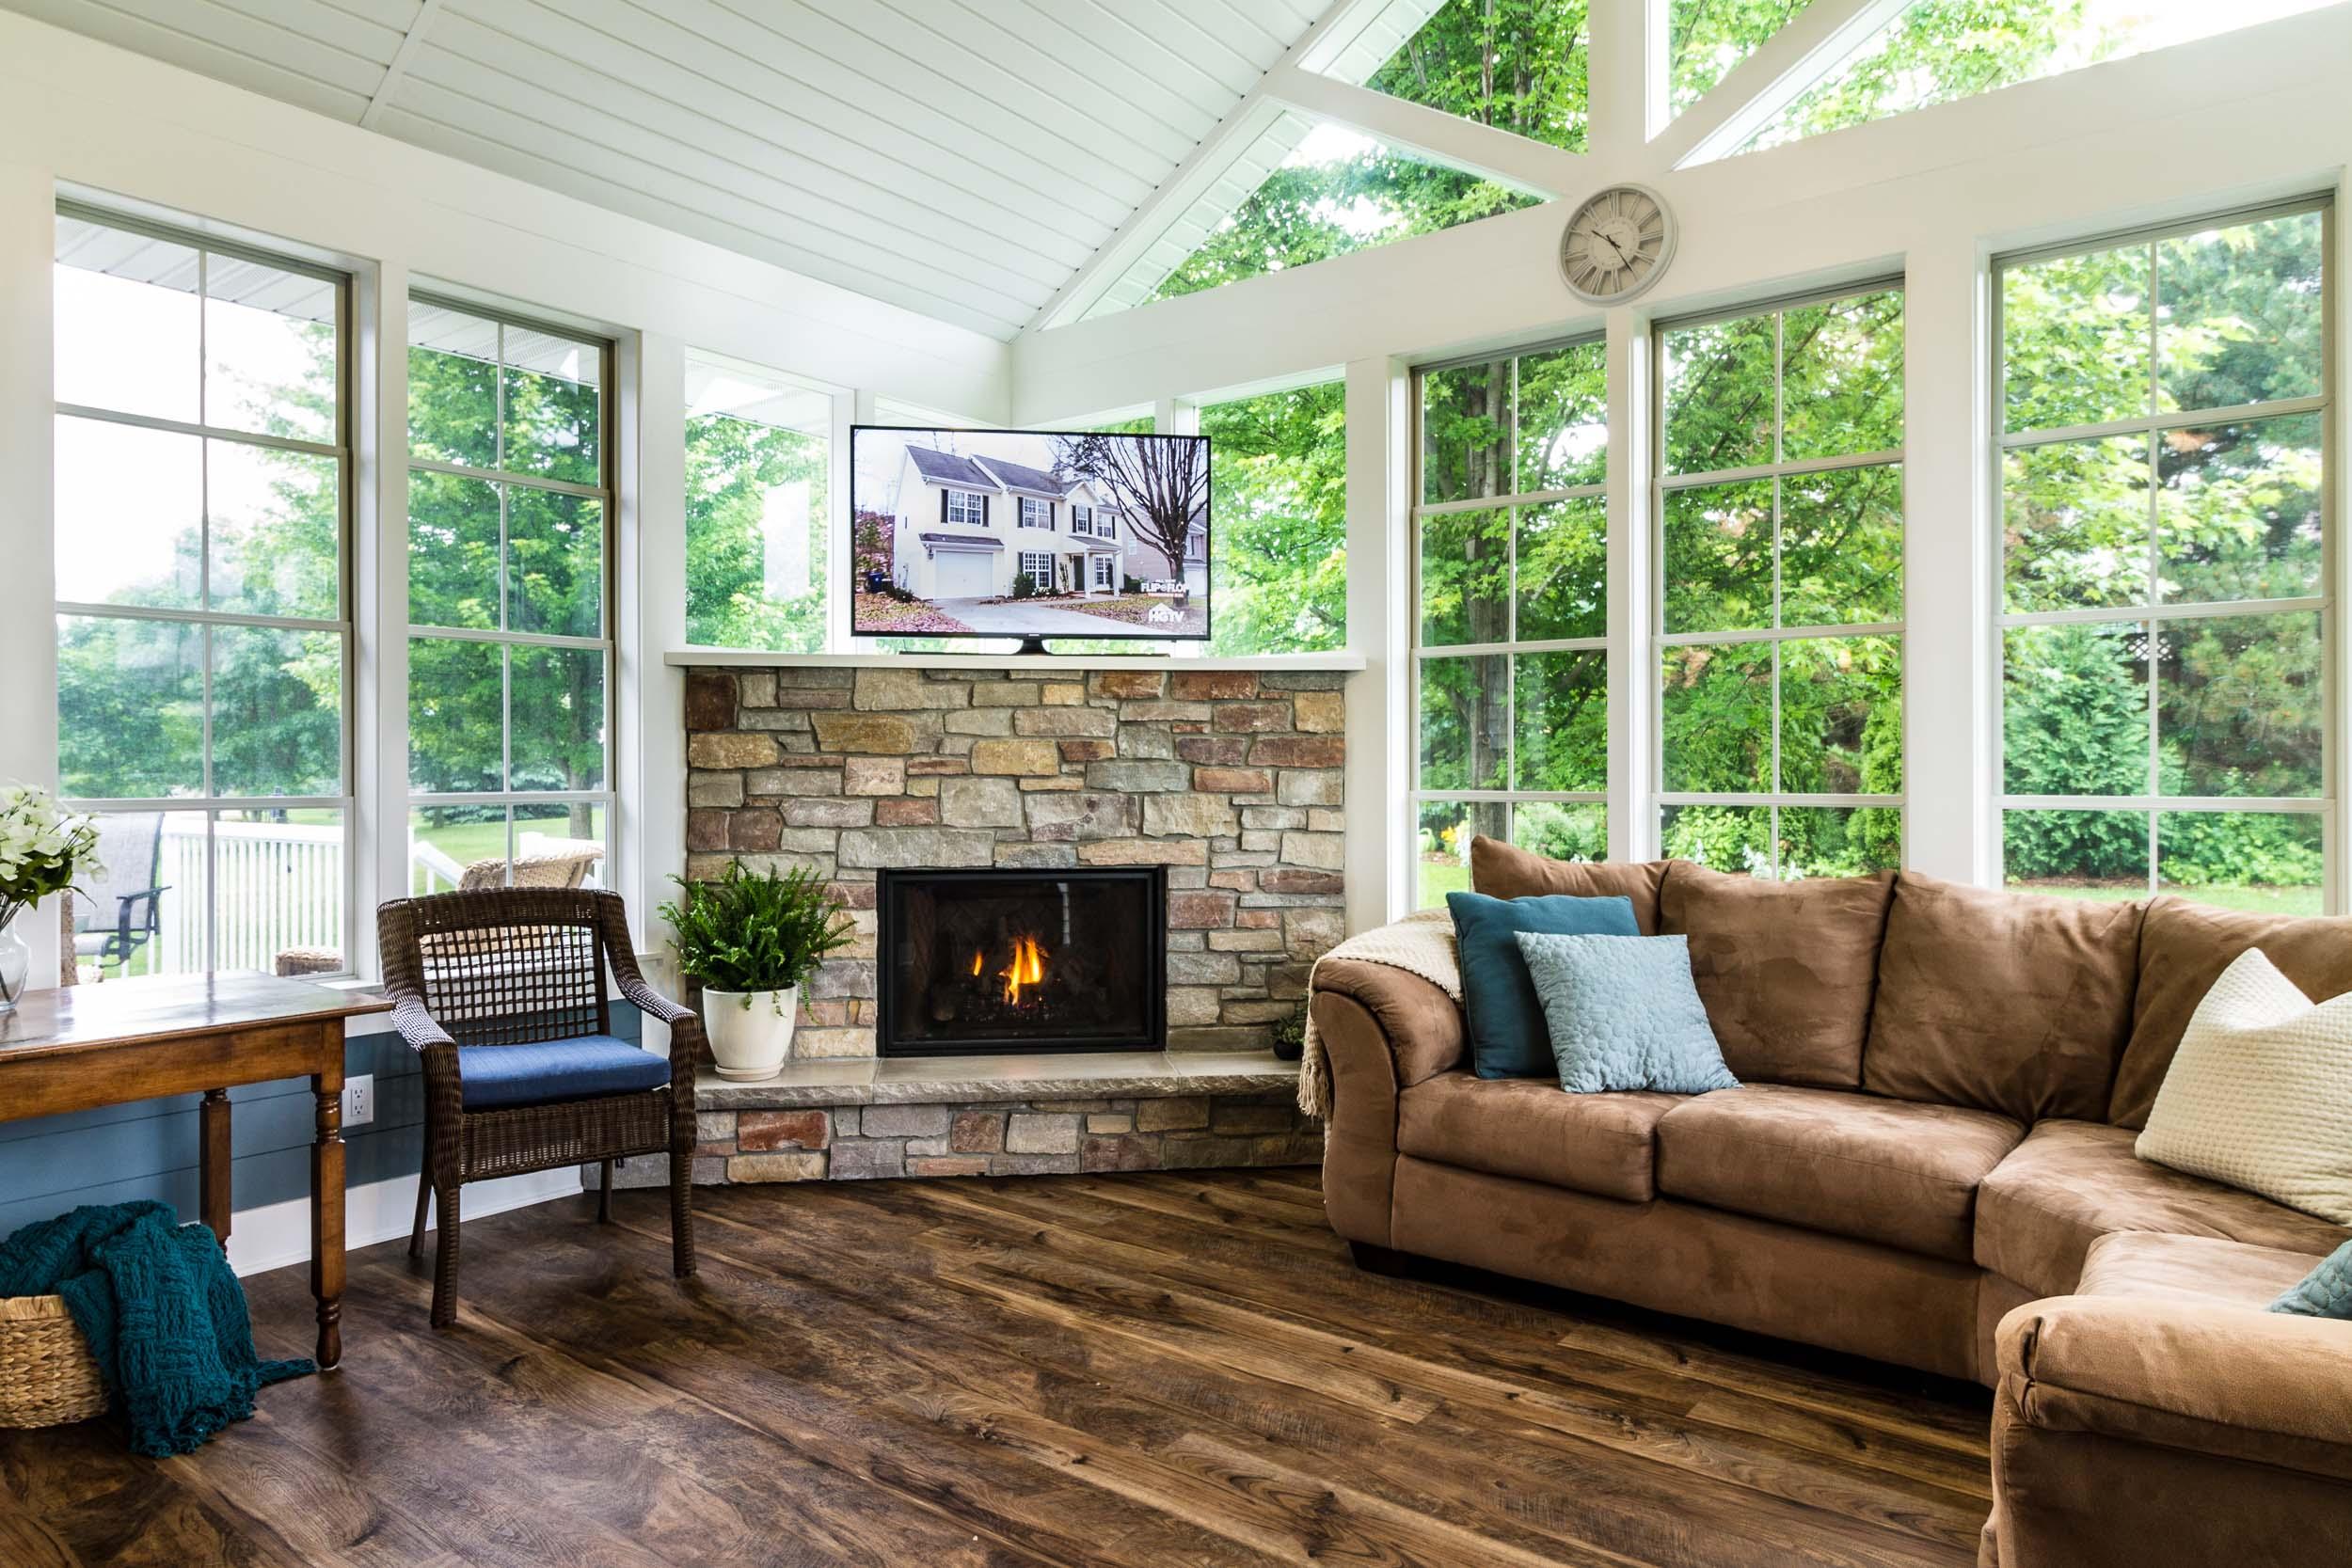 Three Season Porch Transitional Ranch Degnan Design Build